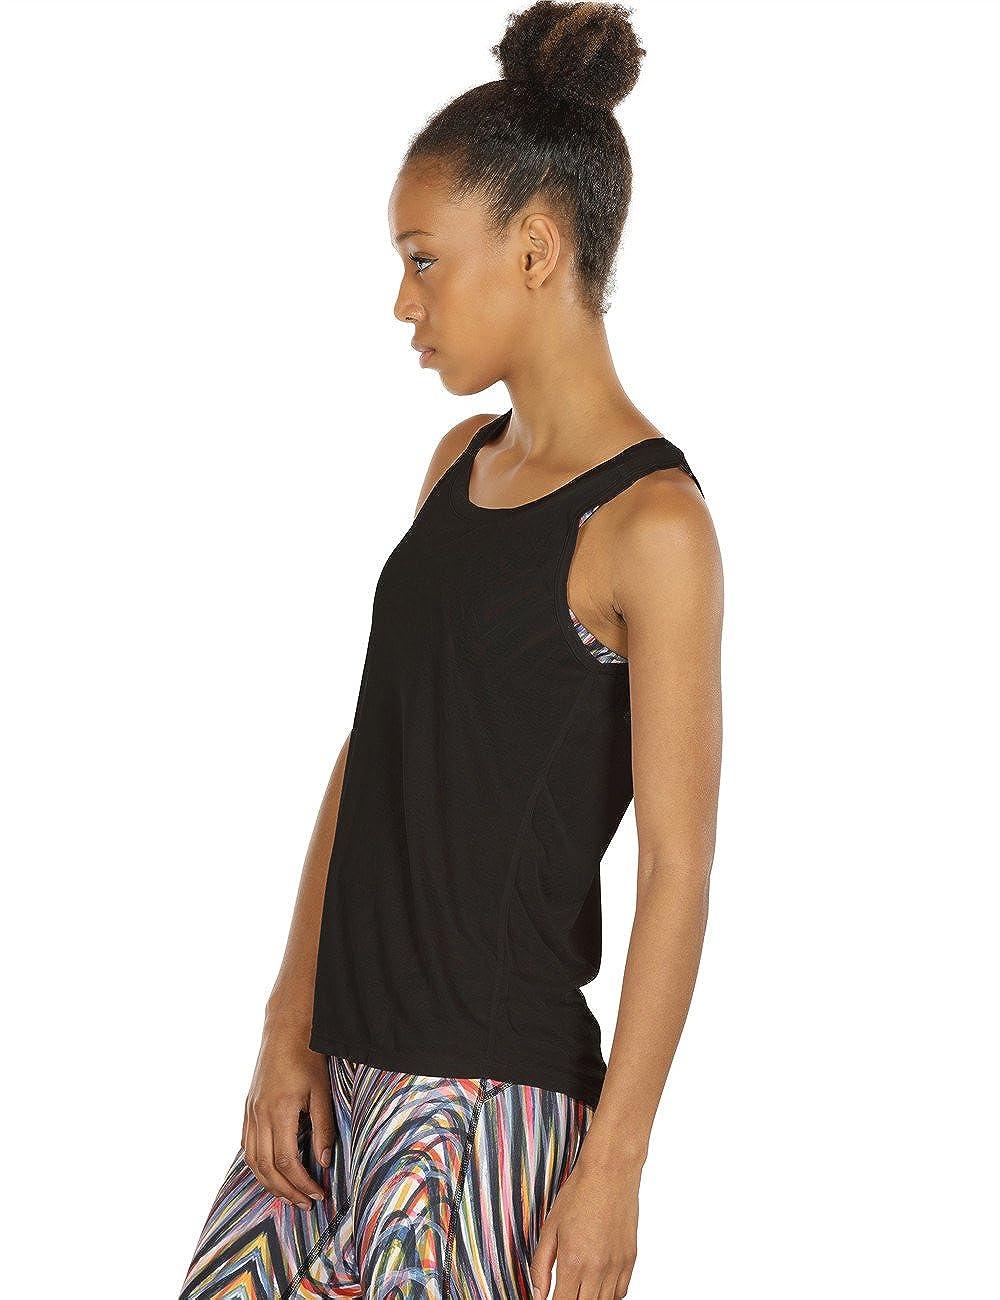 icyzone Dos Ouvert D/ébardeur de Sport Femme Paquet de 2 Tops sans Manches Exercice Yoga Shirt